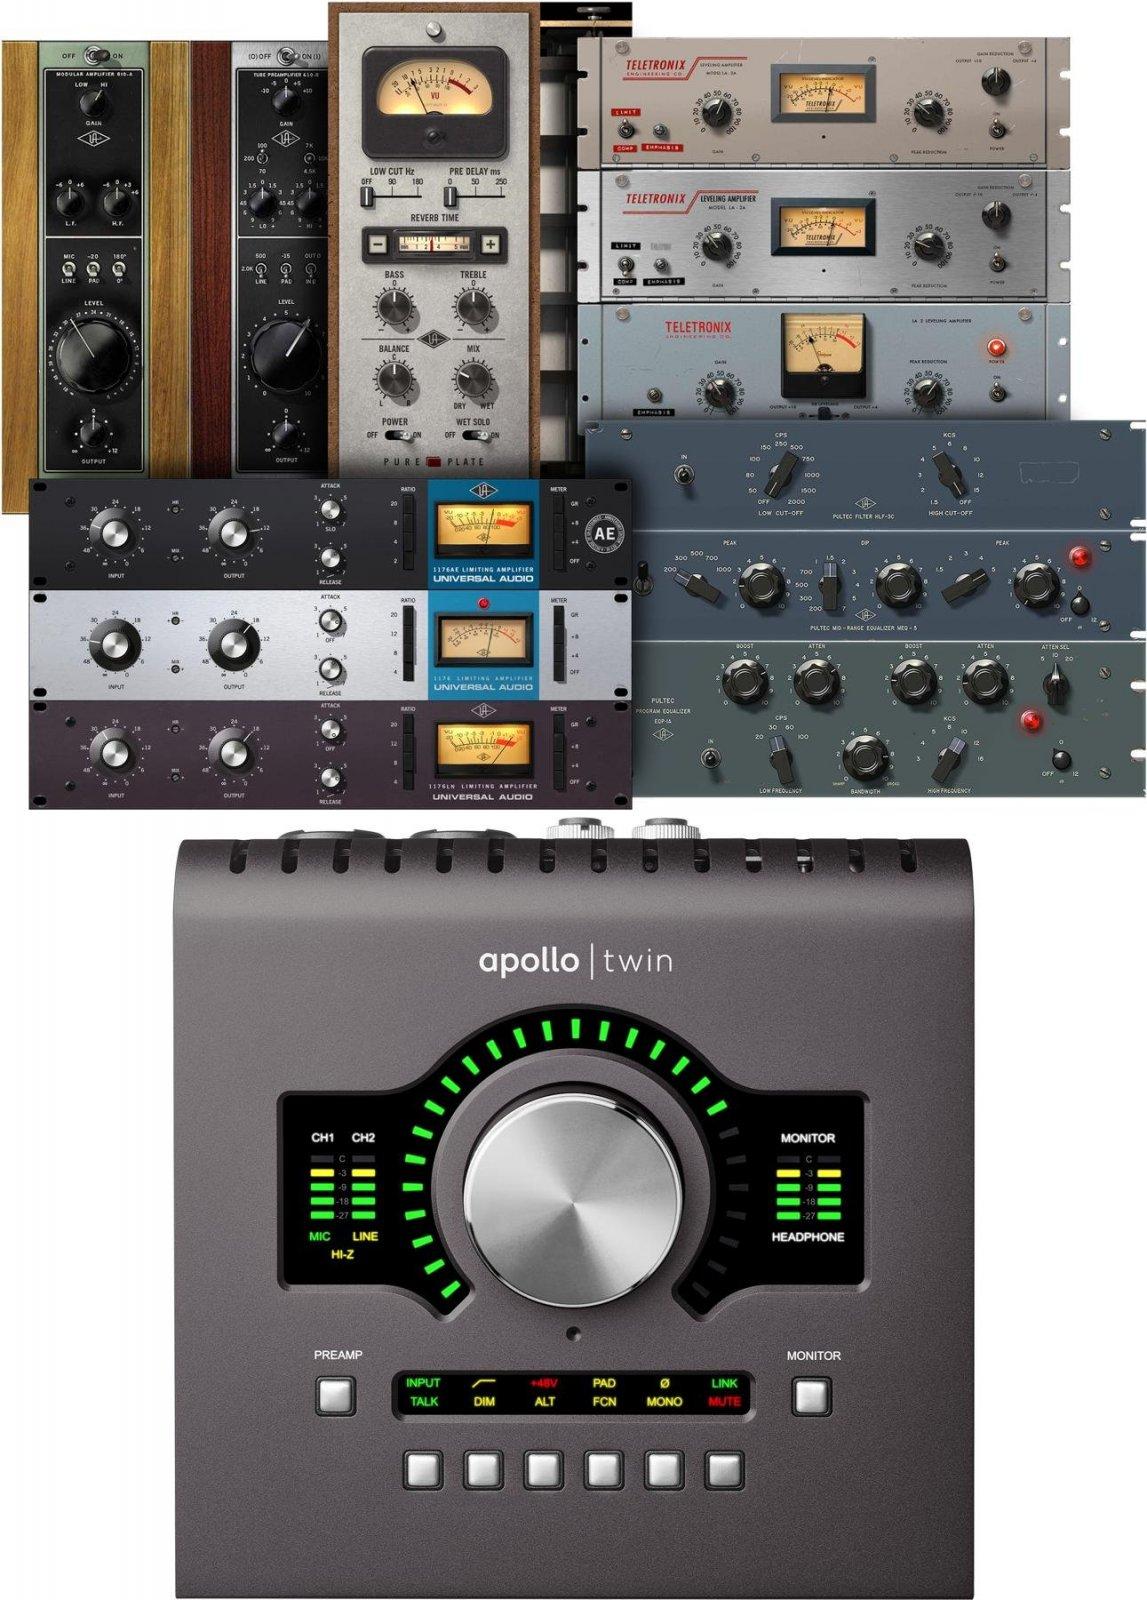 Universal Audio Apollo Twin MkII DUO Audio Interface - Heritage Edition